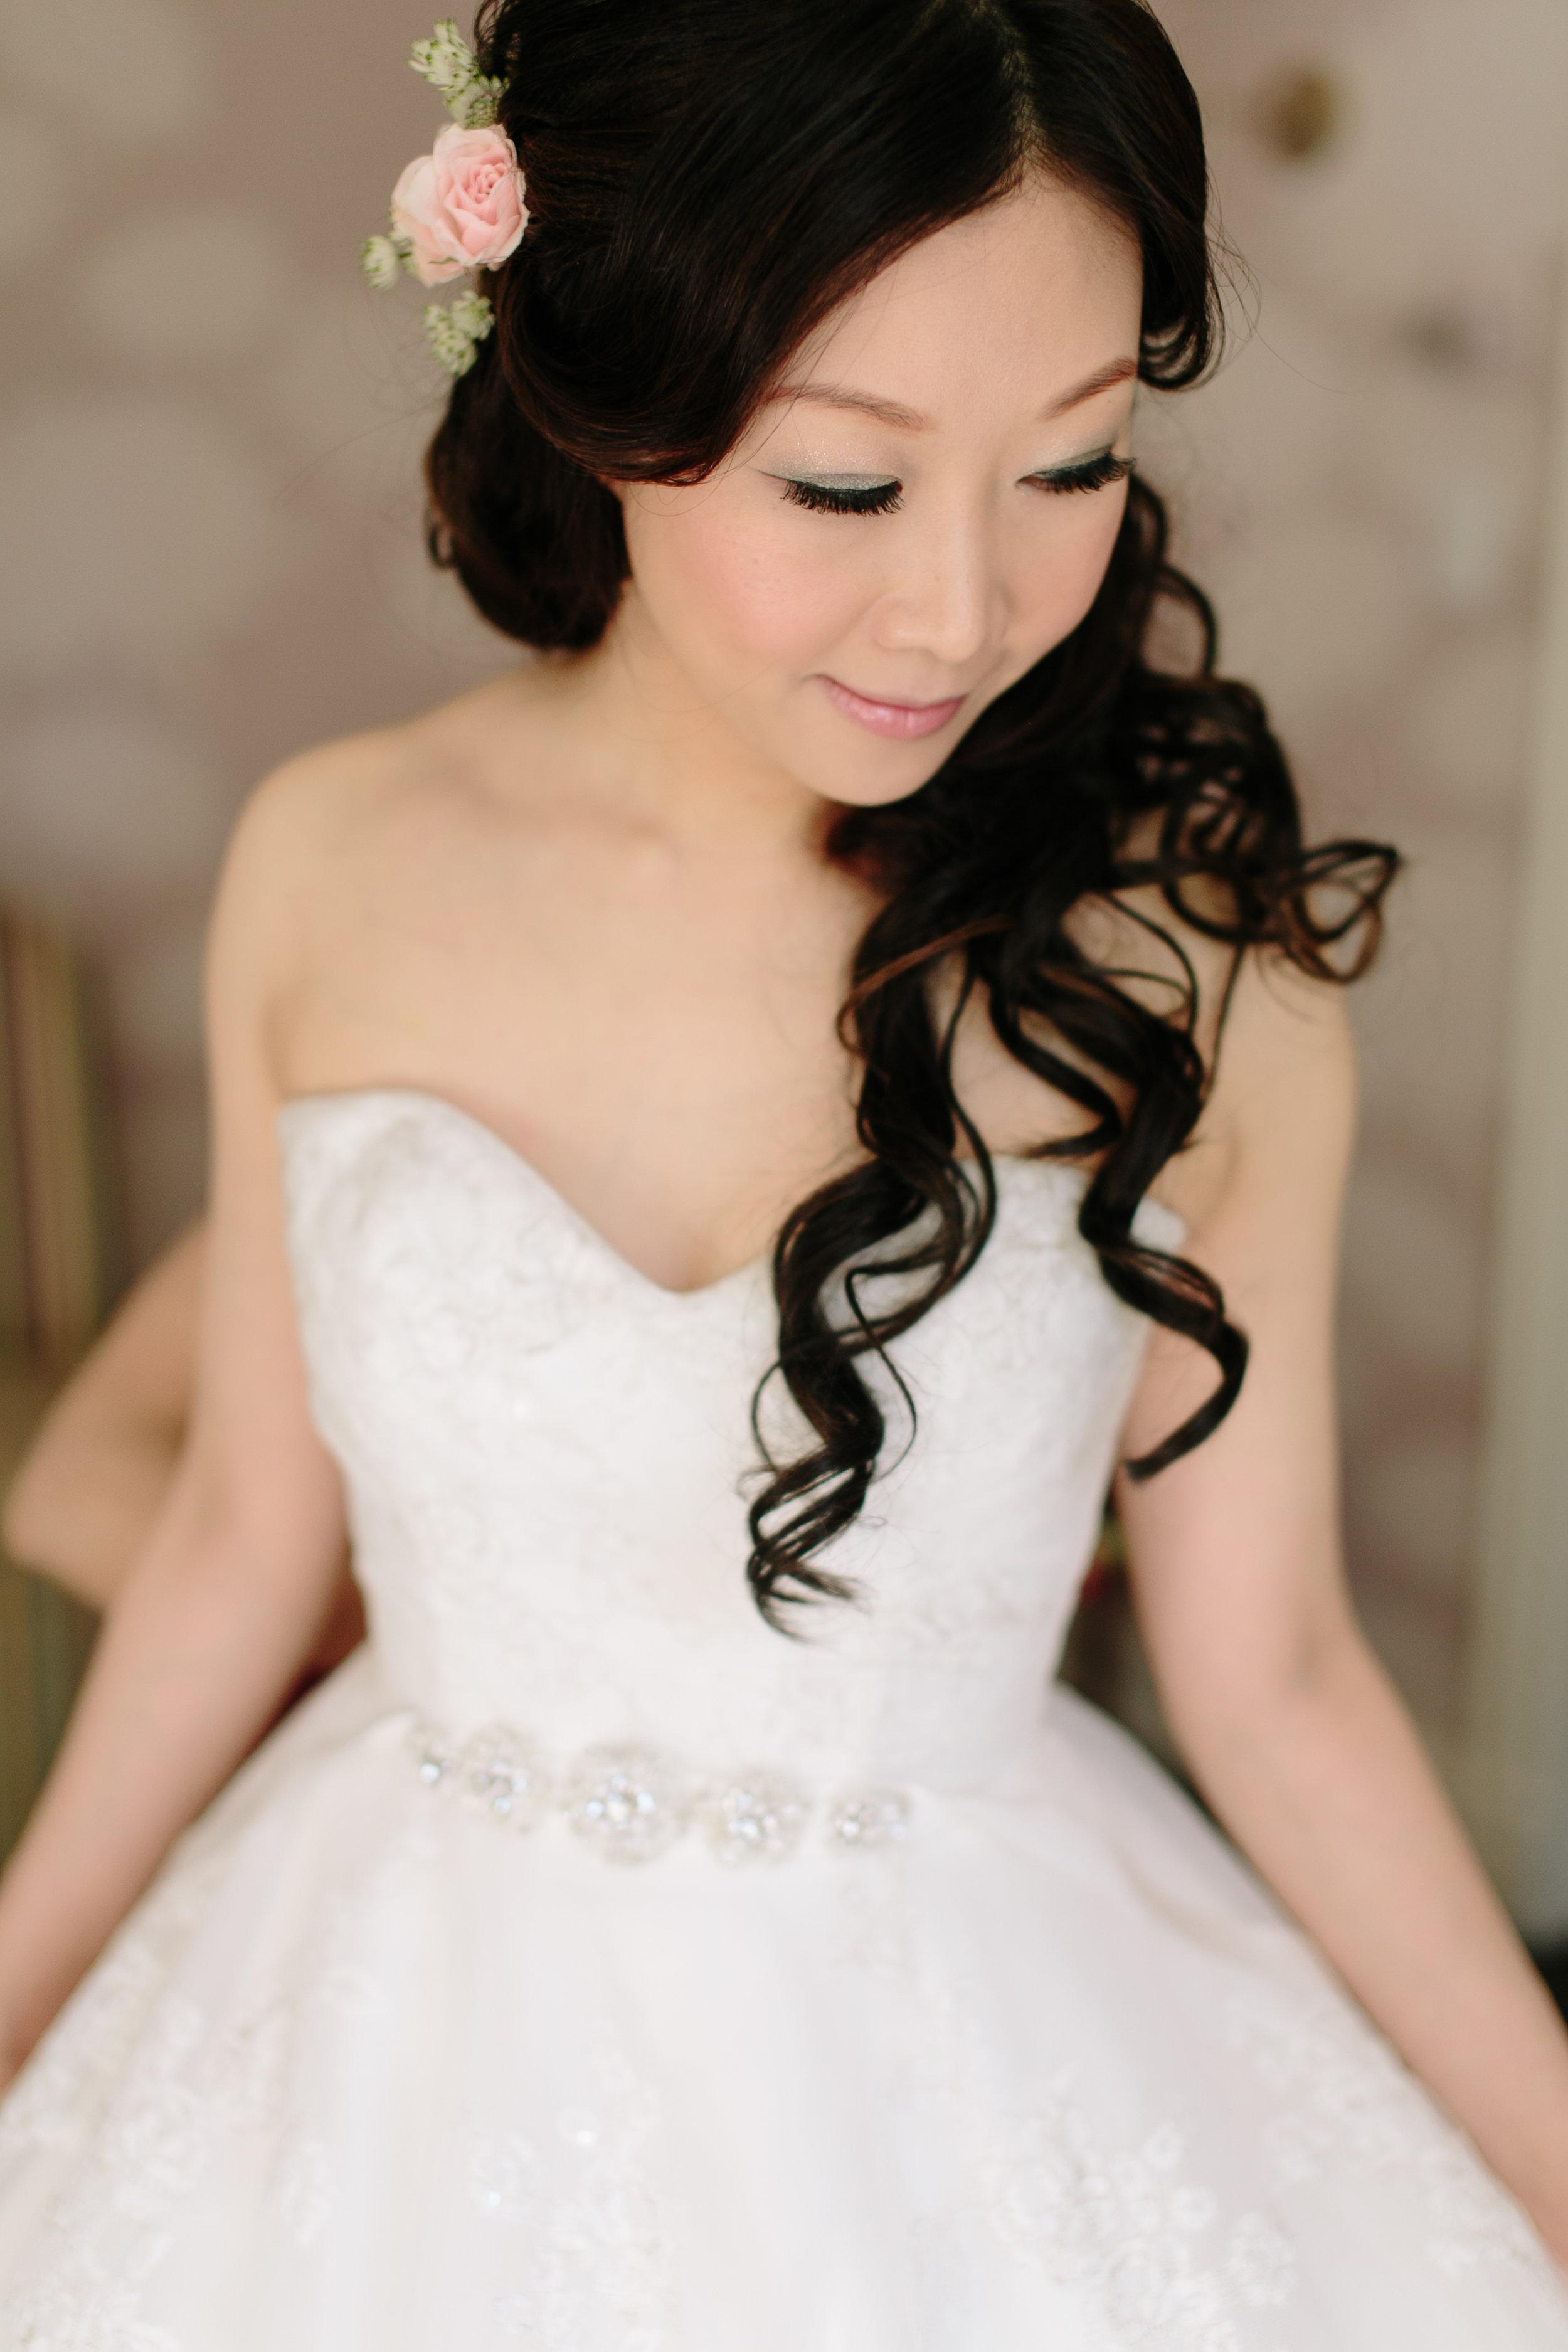 Phoebe Lo Events Toronto Wedding - Estates of Sunnybrook Rustic Event 003.jpg